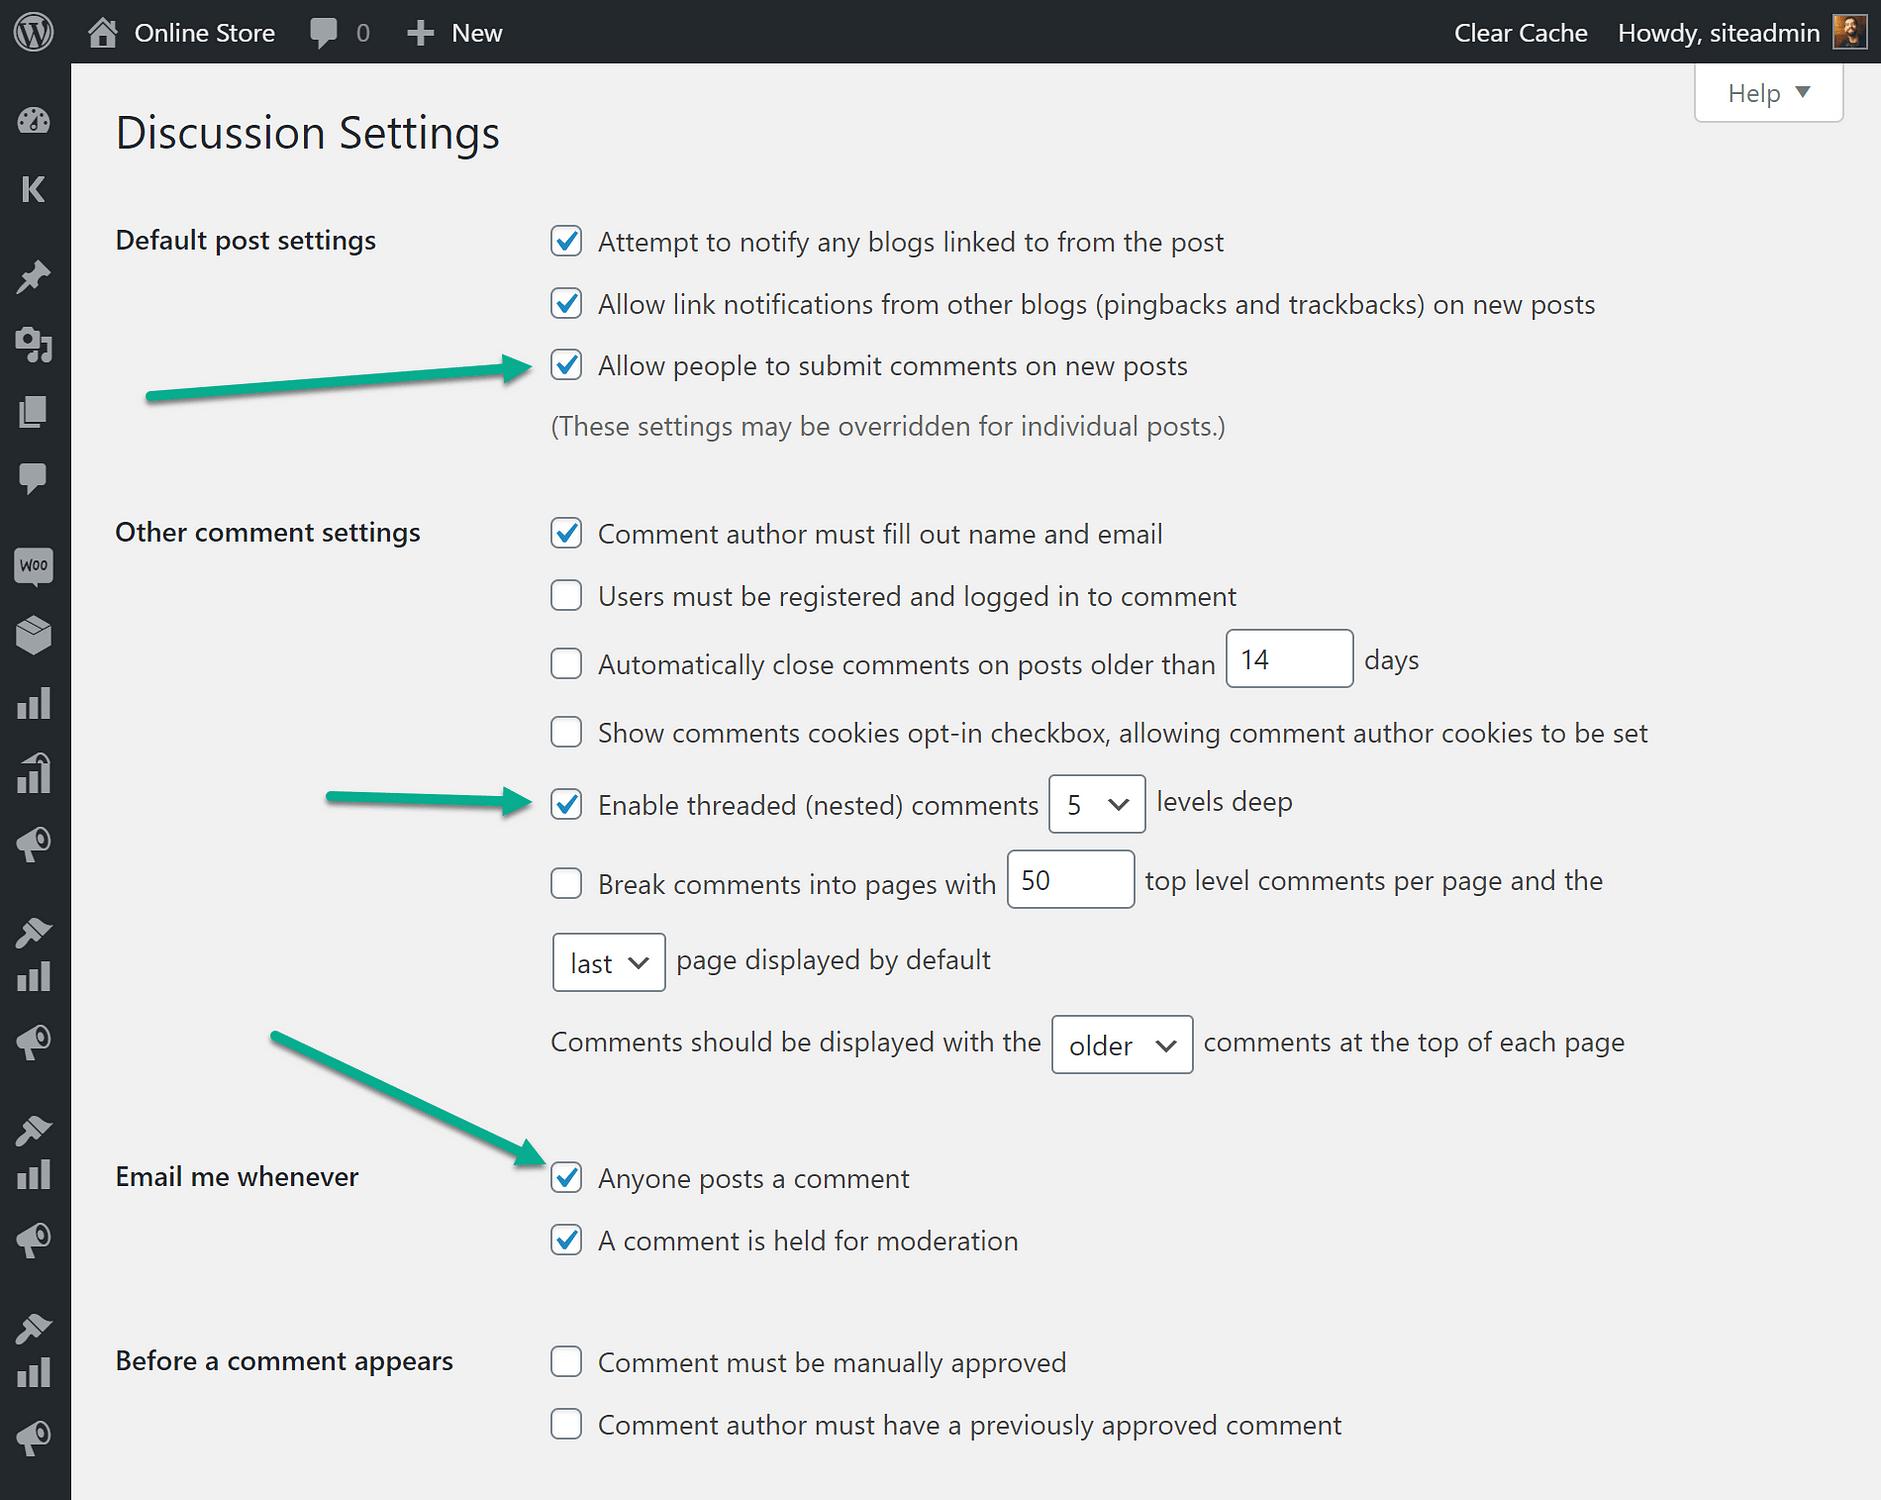 WooCommerce的客户评论的更多设置